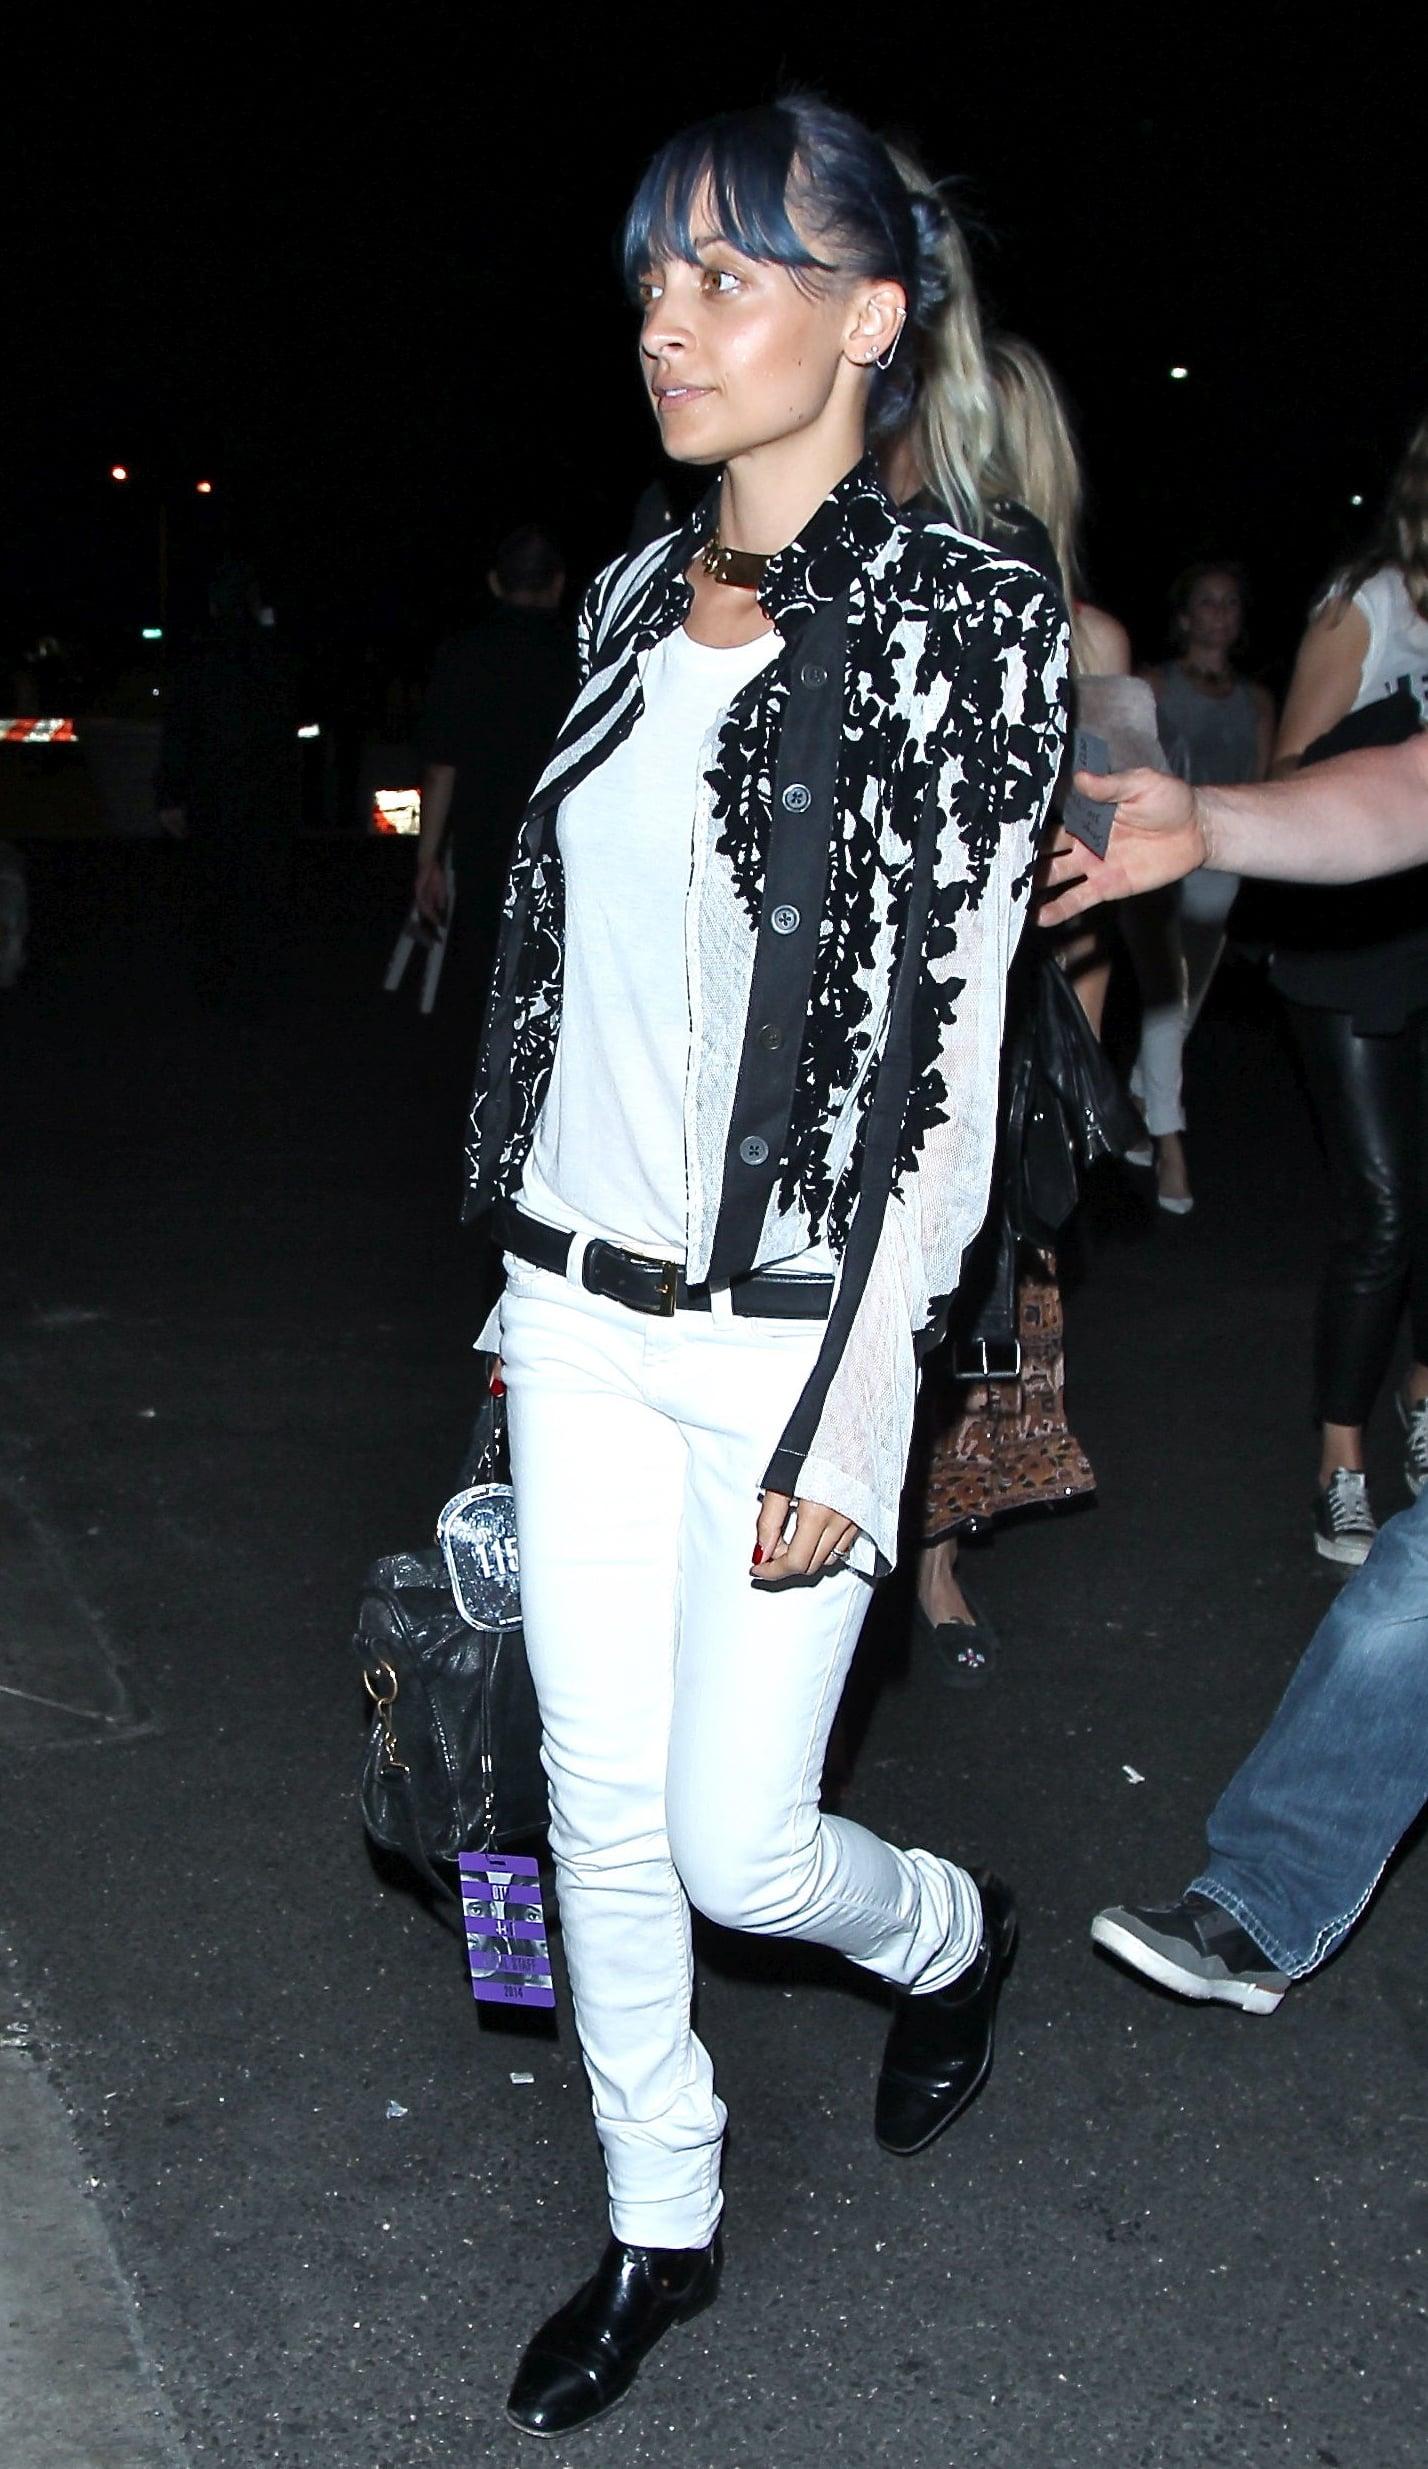 Nicole Richie flew solo to the Saturday gig.